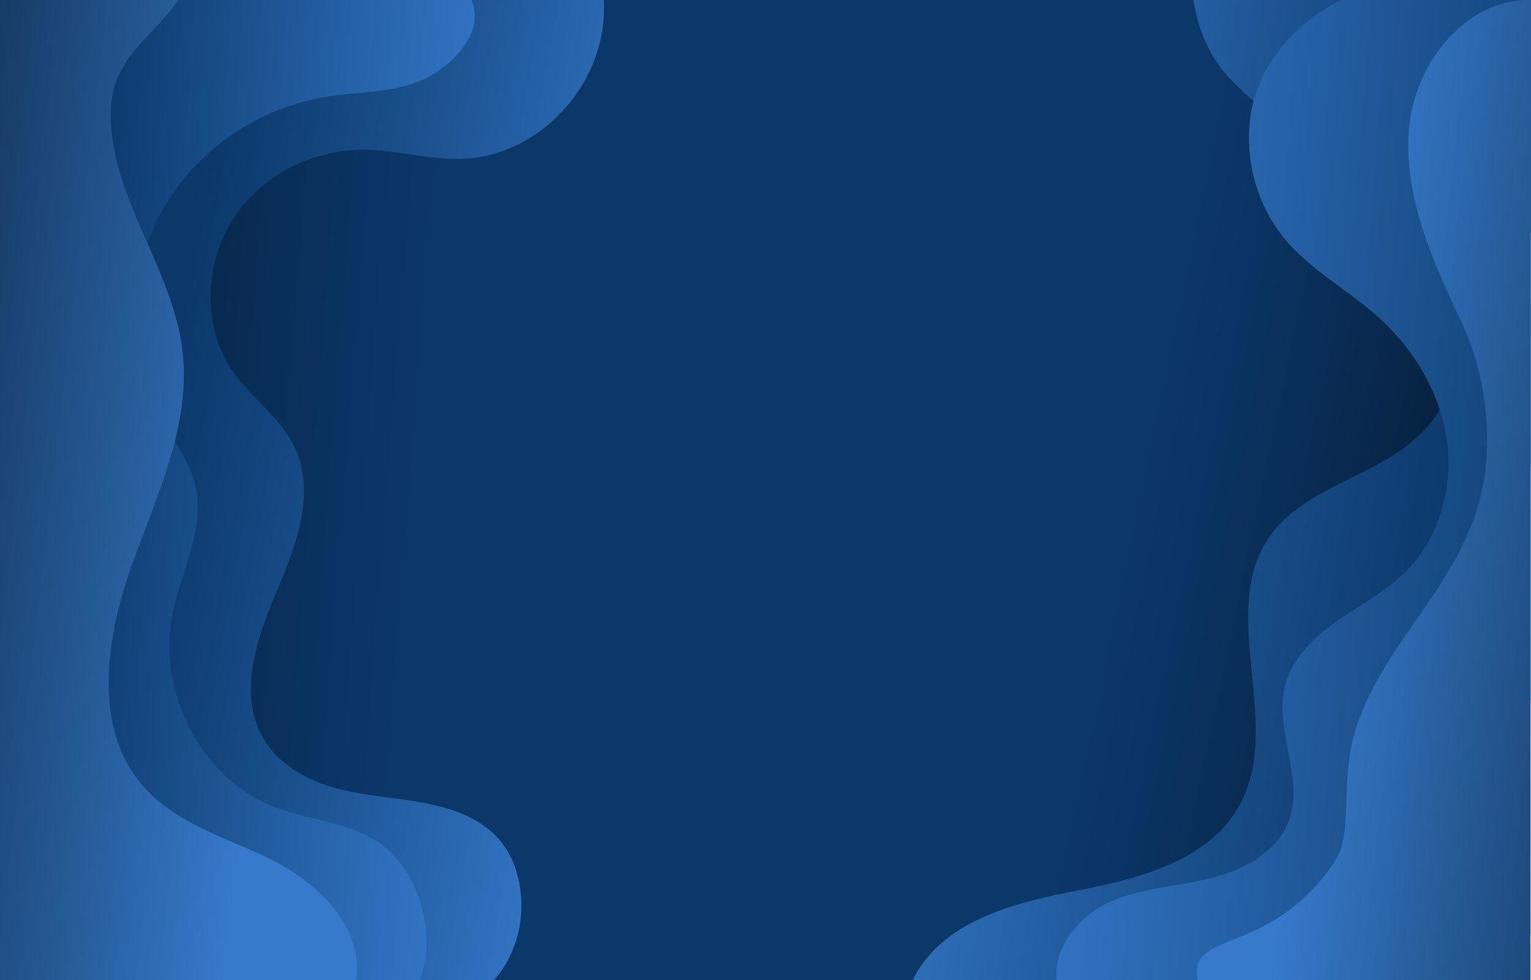 abstracte golf frame uitgesneden achtergrond vector